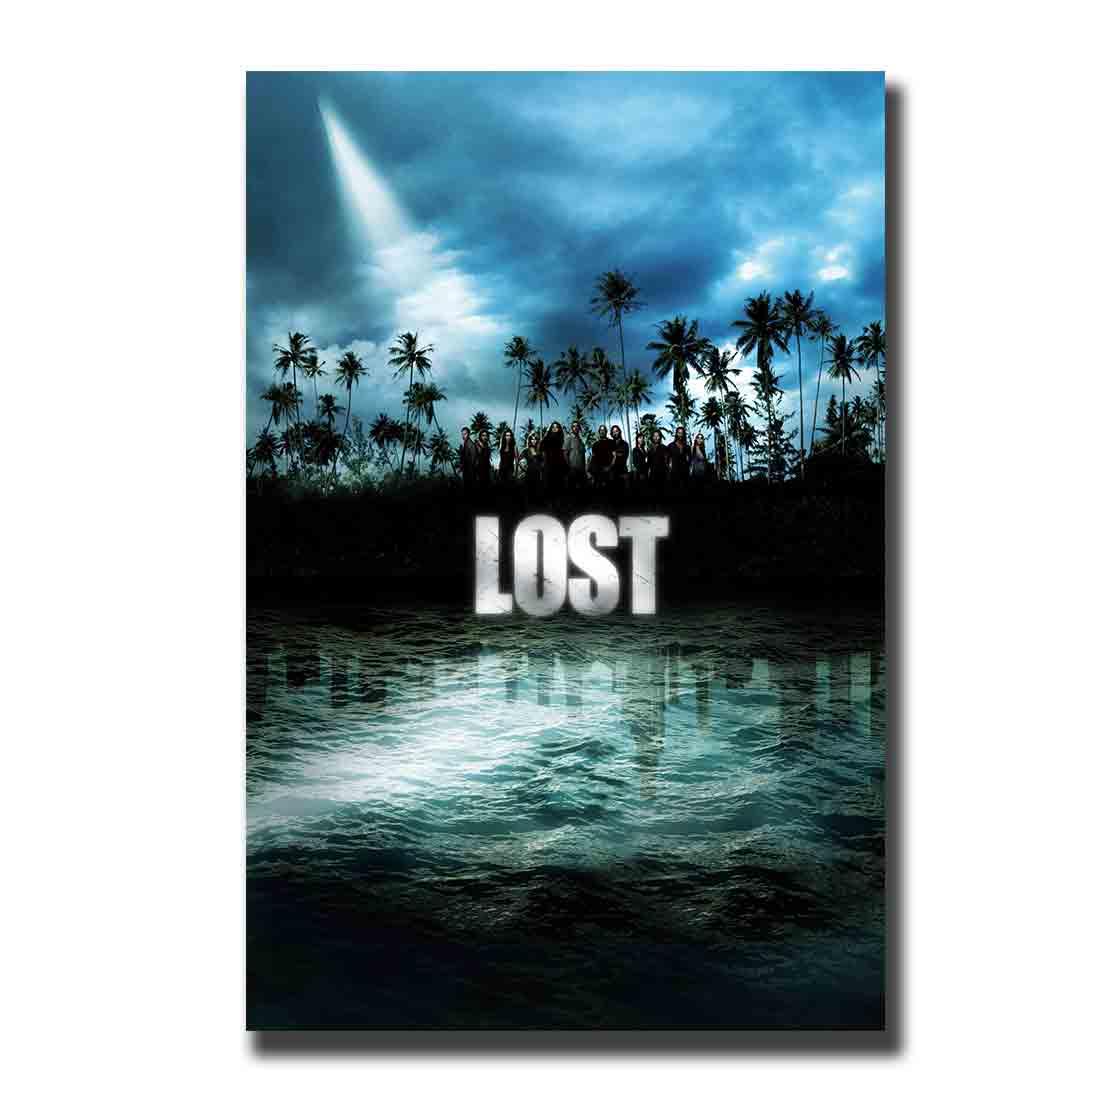 LOST TV The Island Jack Kate Hurley Lock Ben Jacob художественный постер на заказ для дома 8x1212x18 24x36decoration холст для гостиной